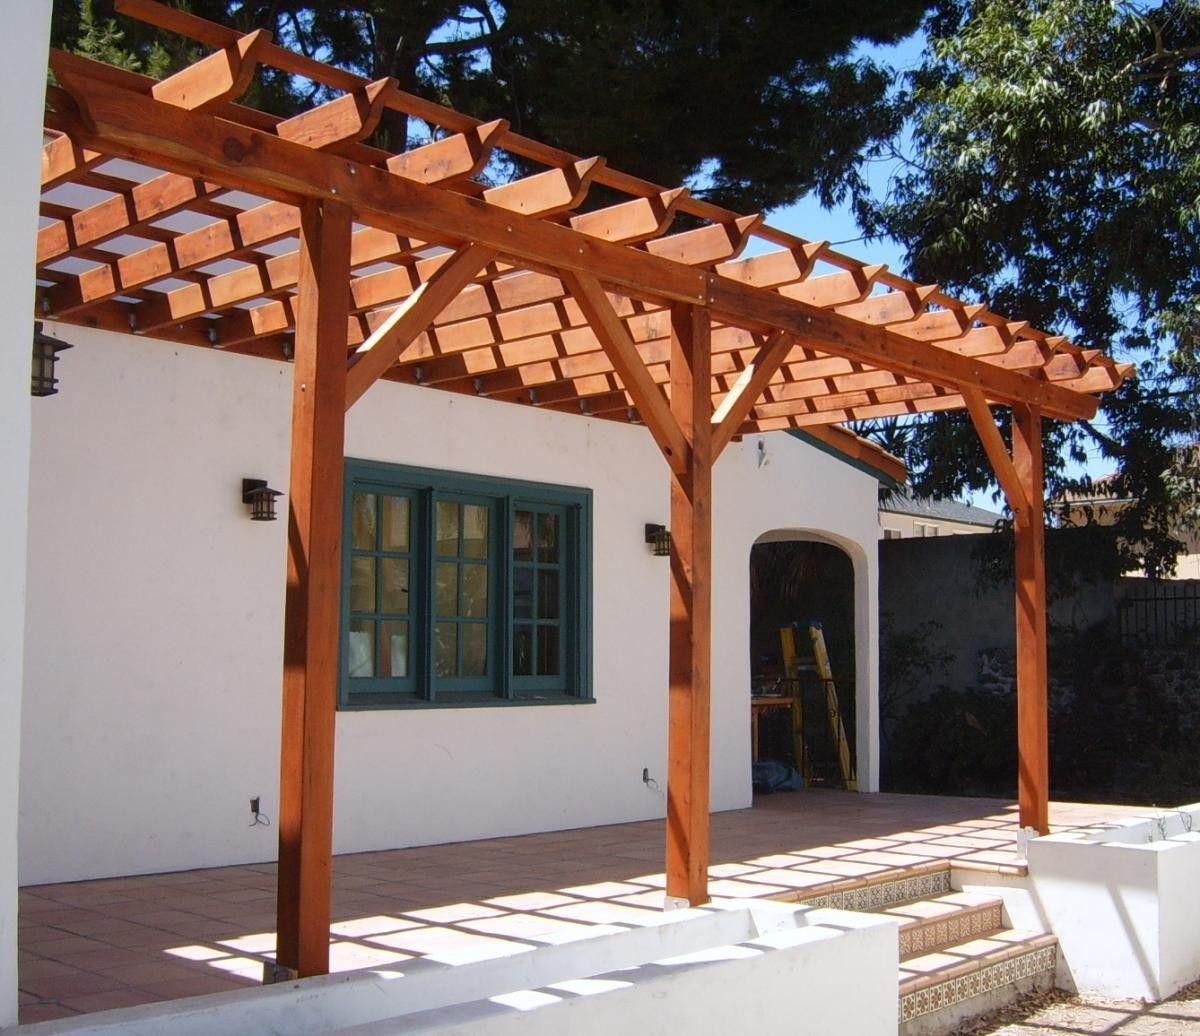 Pergola Attached To House Pergola Board Pinterest Pergola